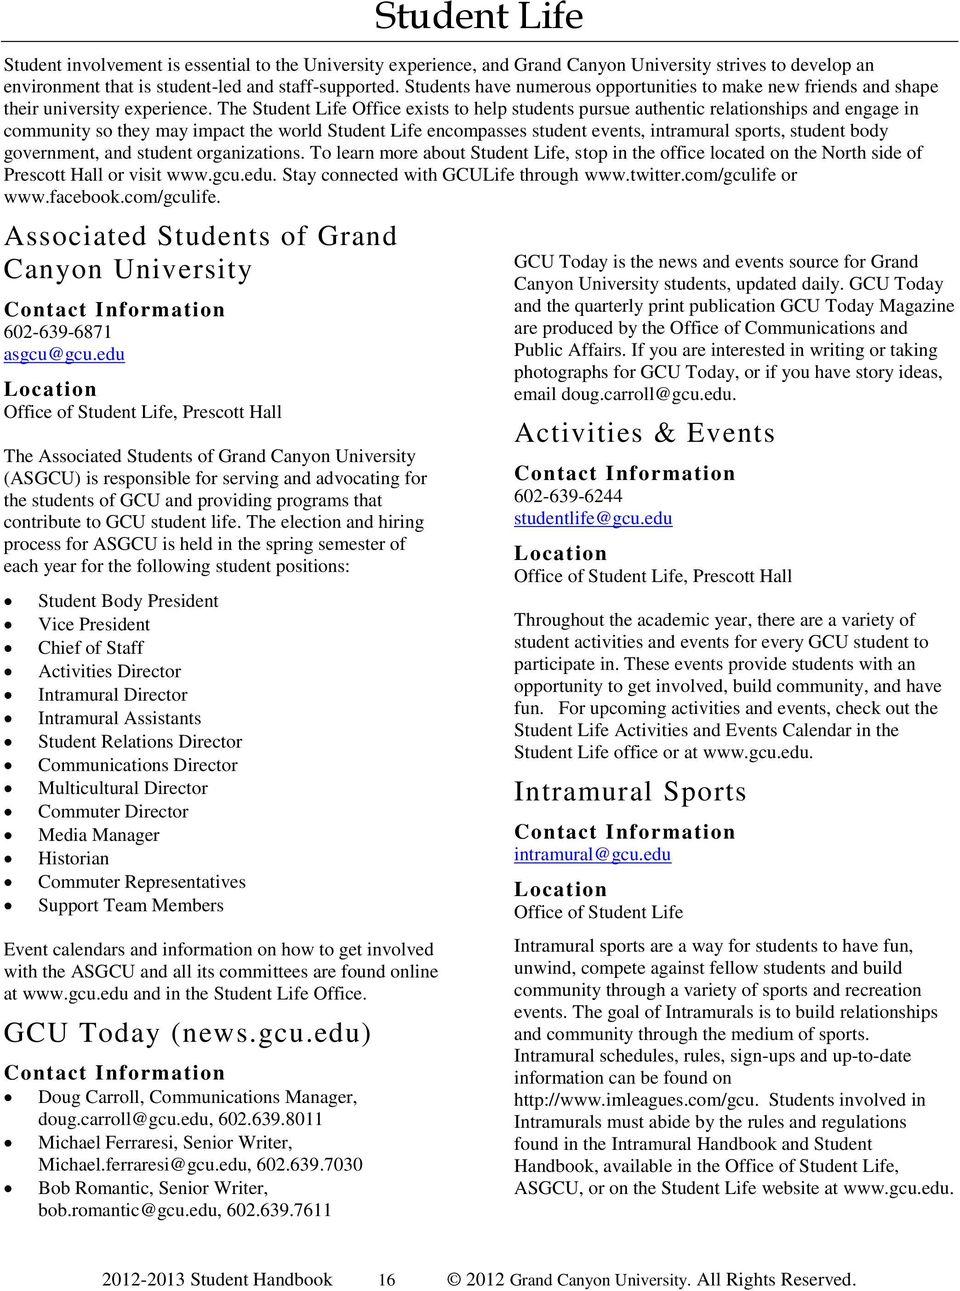 Grand Canyon University Student Handbook - Pdf Free Download With Gcu Academic Calendar